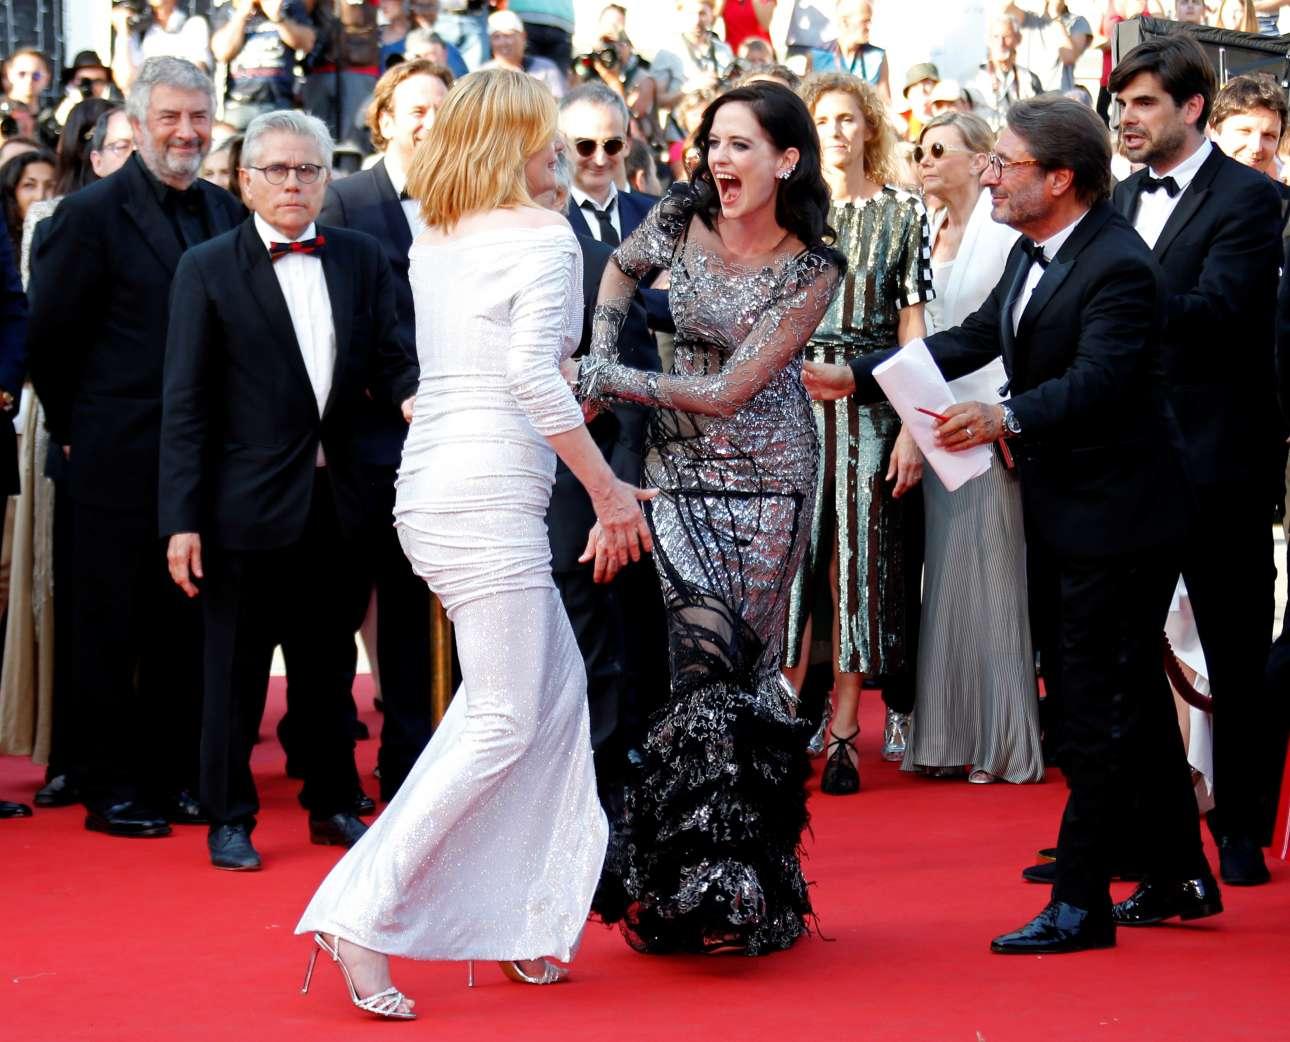 «Based on a True Story» (=Βασισμένη σε αληθινή ιστορία), αυτός είναι ο τίτλος της νέας ταινίας του Ρομάν Πολάνσκι που παρουσιάστηκε στο φεστιβάλ Καννών εκτός διαγωνιστικού προγράμματος. Πρωταγωνίστριες είναι η σύζυγος του σκηνοθέτη, Εμανουέλ Σενιέ (με το άσπρο φόρεμα), και η Ευα Γκριν